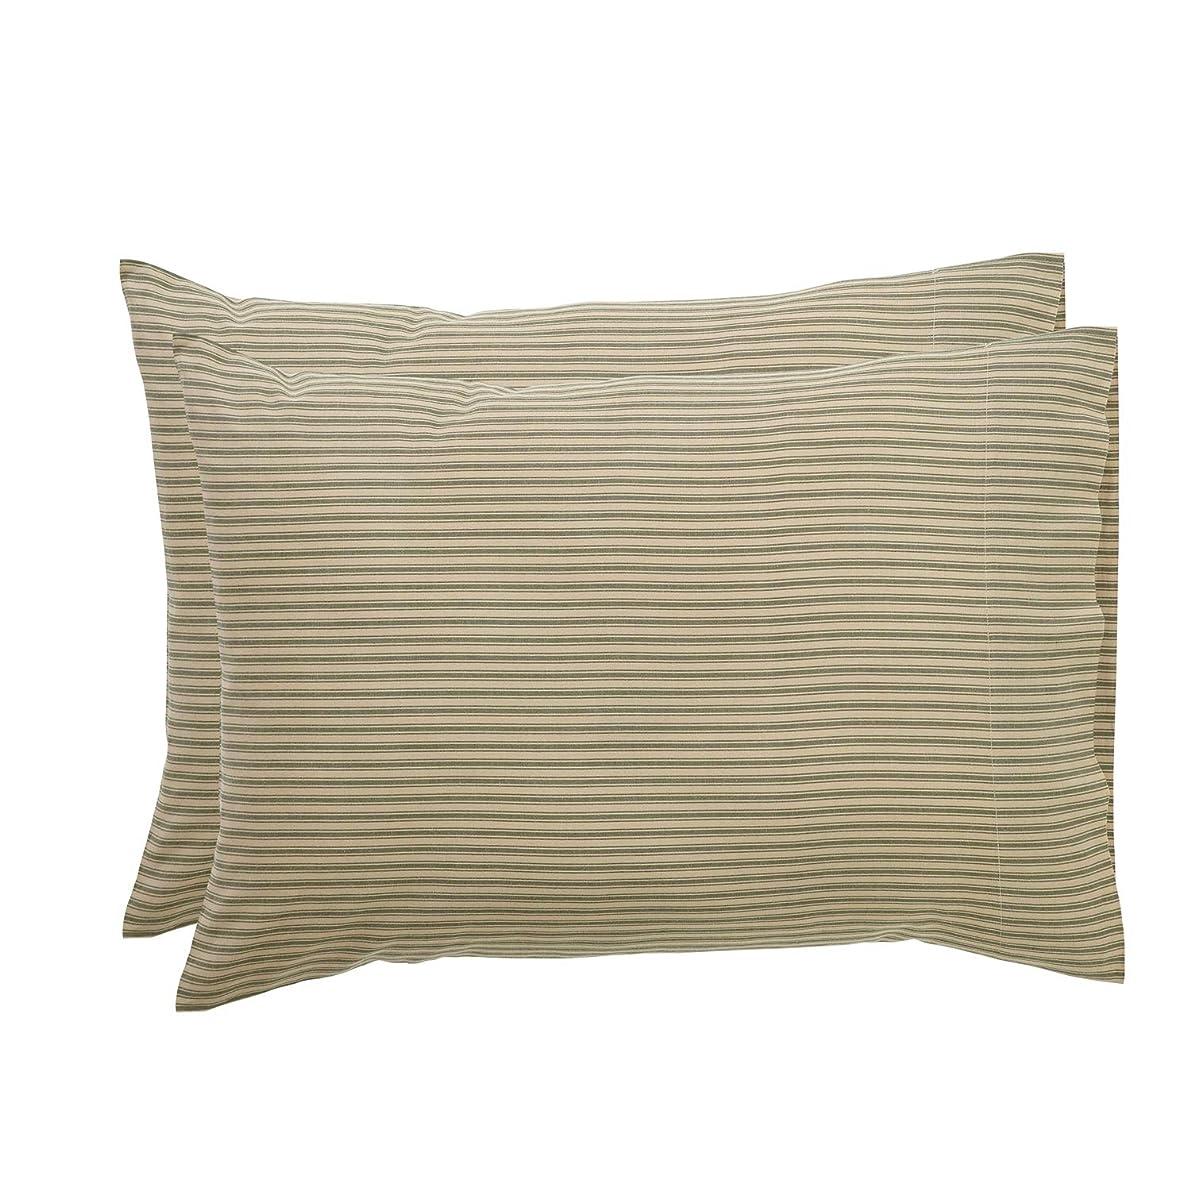 VHC Brands Farmhouse Bedding Prairie Winds Ticking Stripe Tan Pillow Case Set of 2,